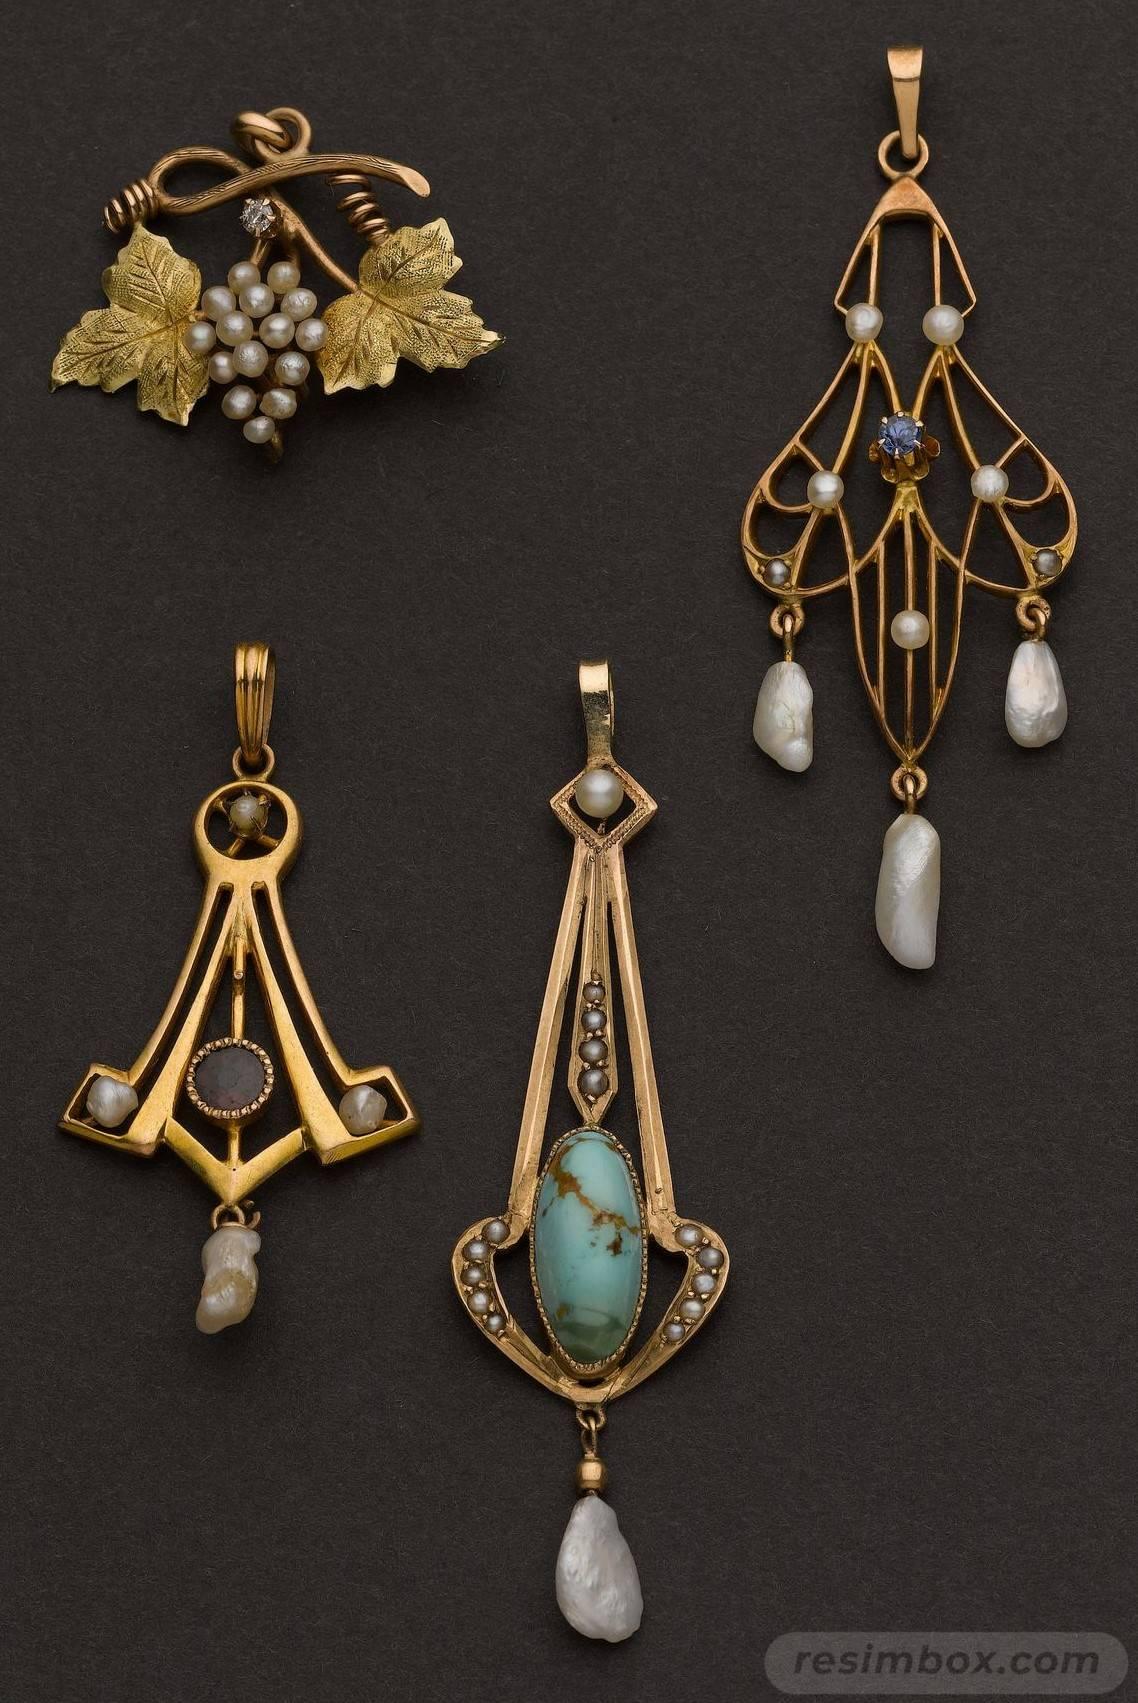 Art deco jewelry-102738435234837503